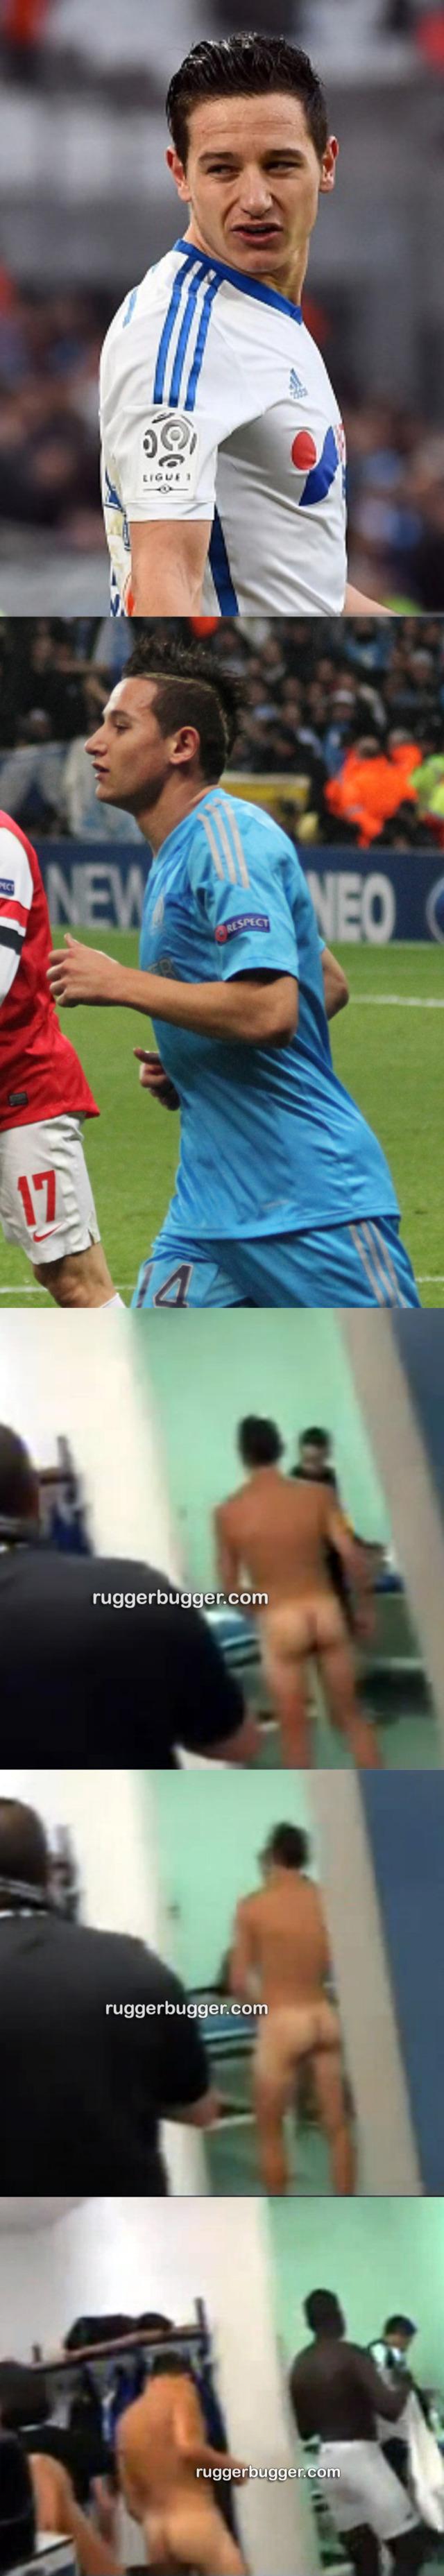 footballer florian thauvin naked ass lockerroom